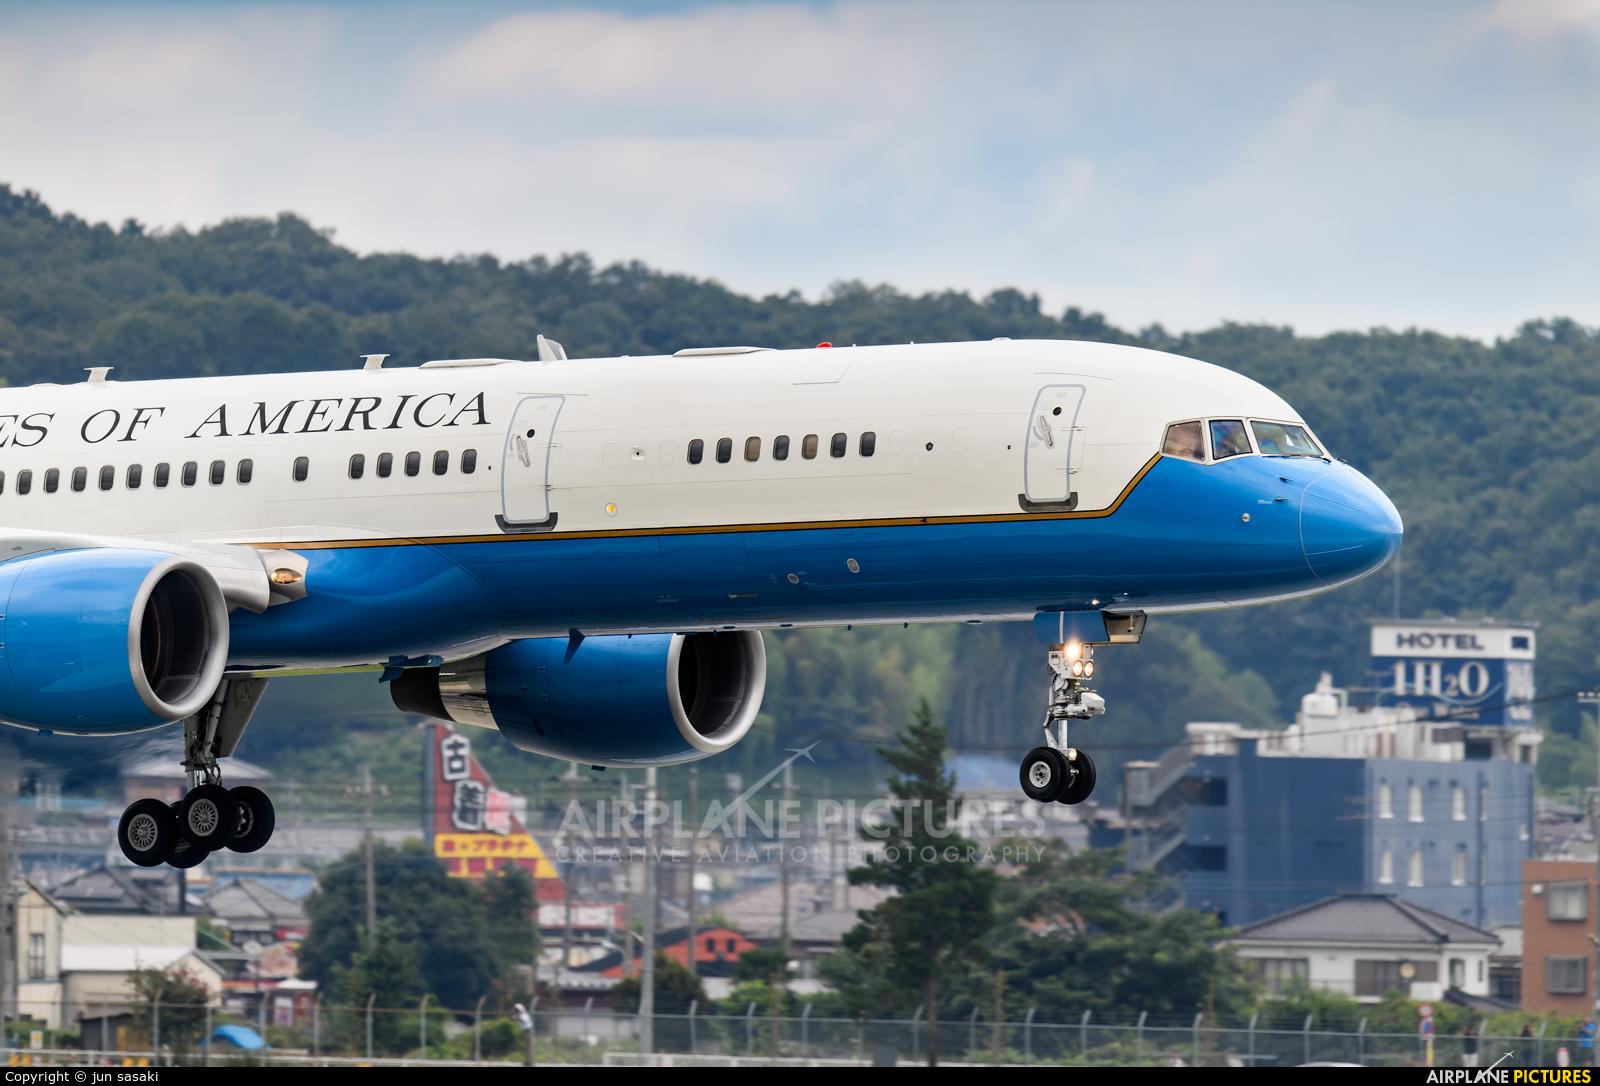 USA - Air Force 98-0002 aircraft at Yokota AB